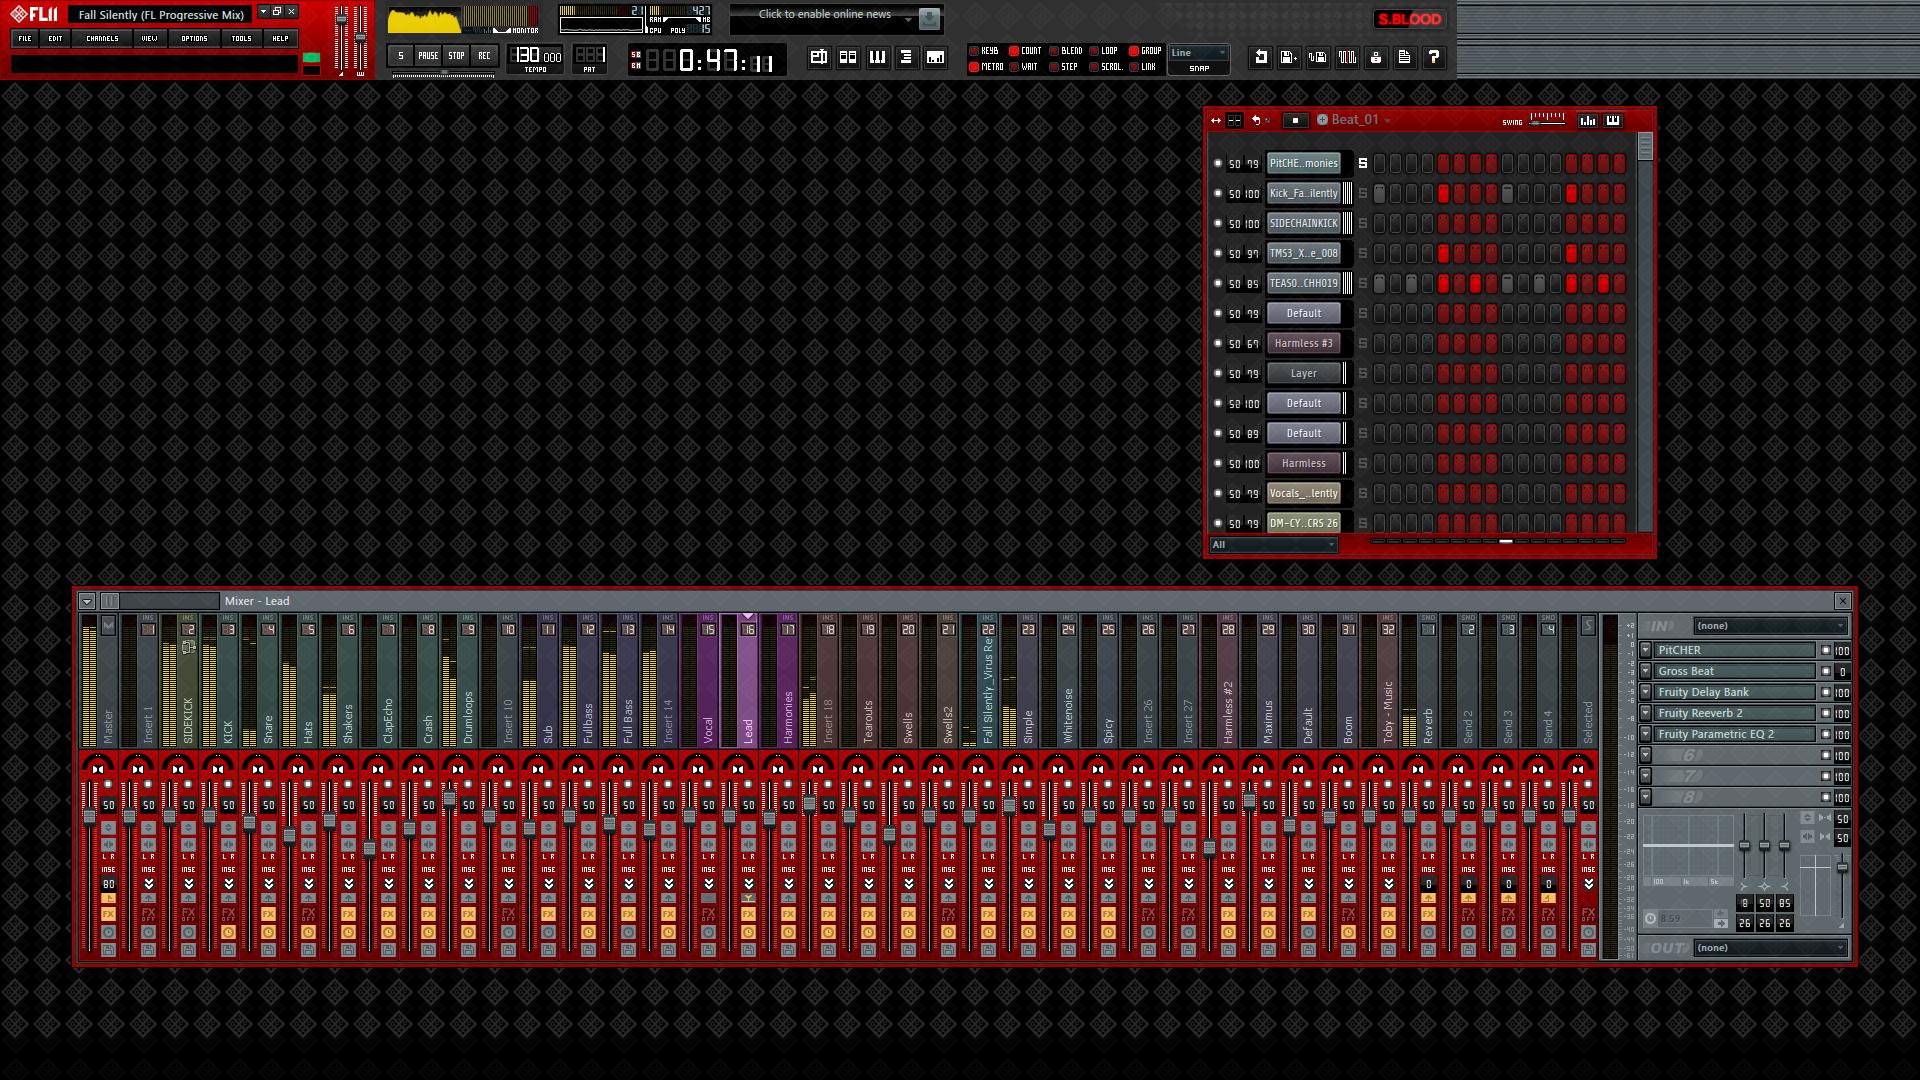 fl studio 12 custom skins download